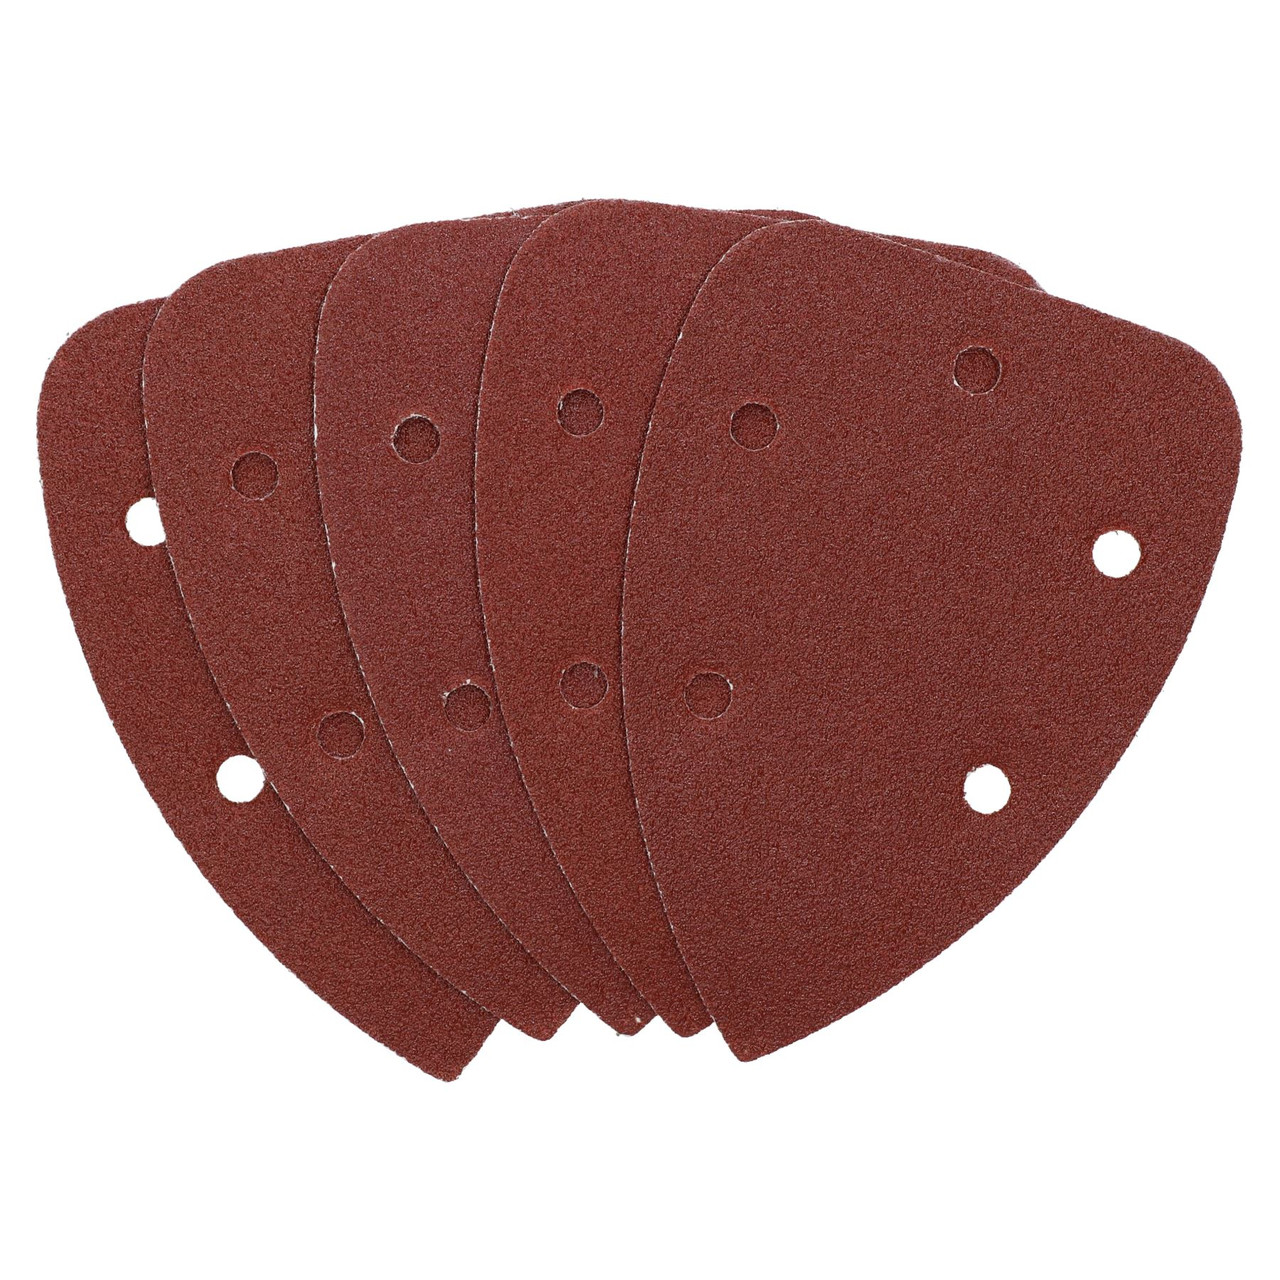 Hook And Loop Detail Sanding Pads Discs 140mm Triangular 80 Grit Medium 5pc